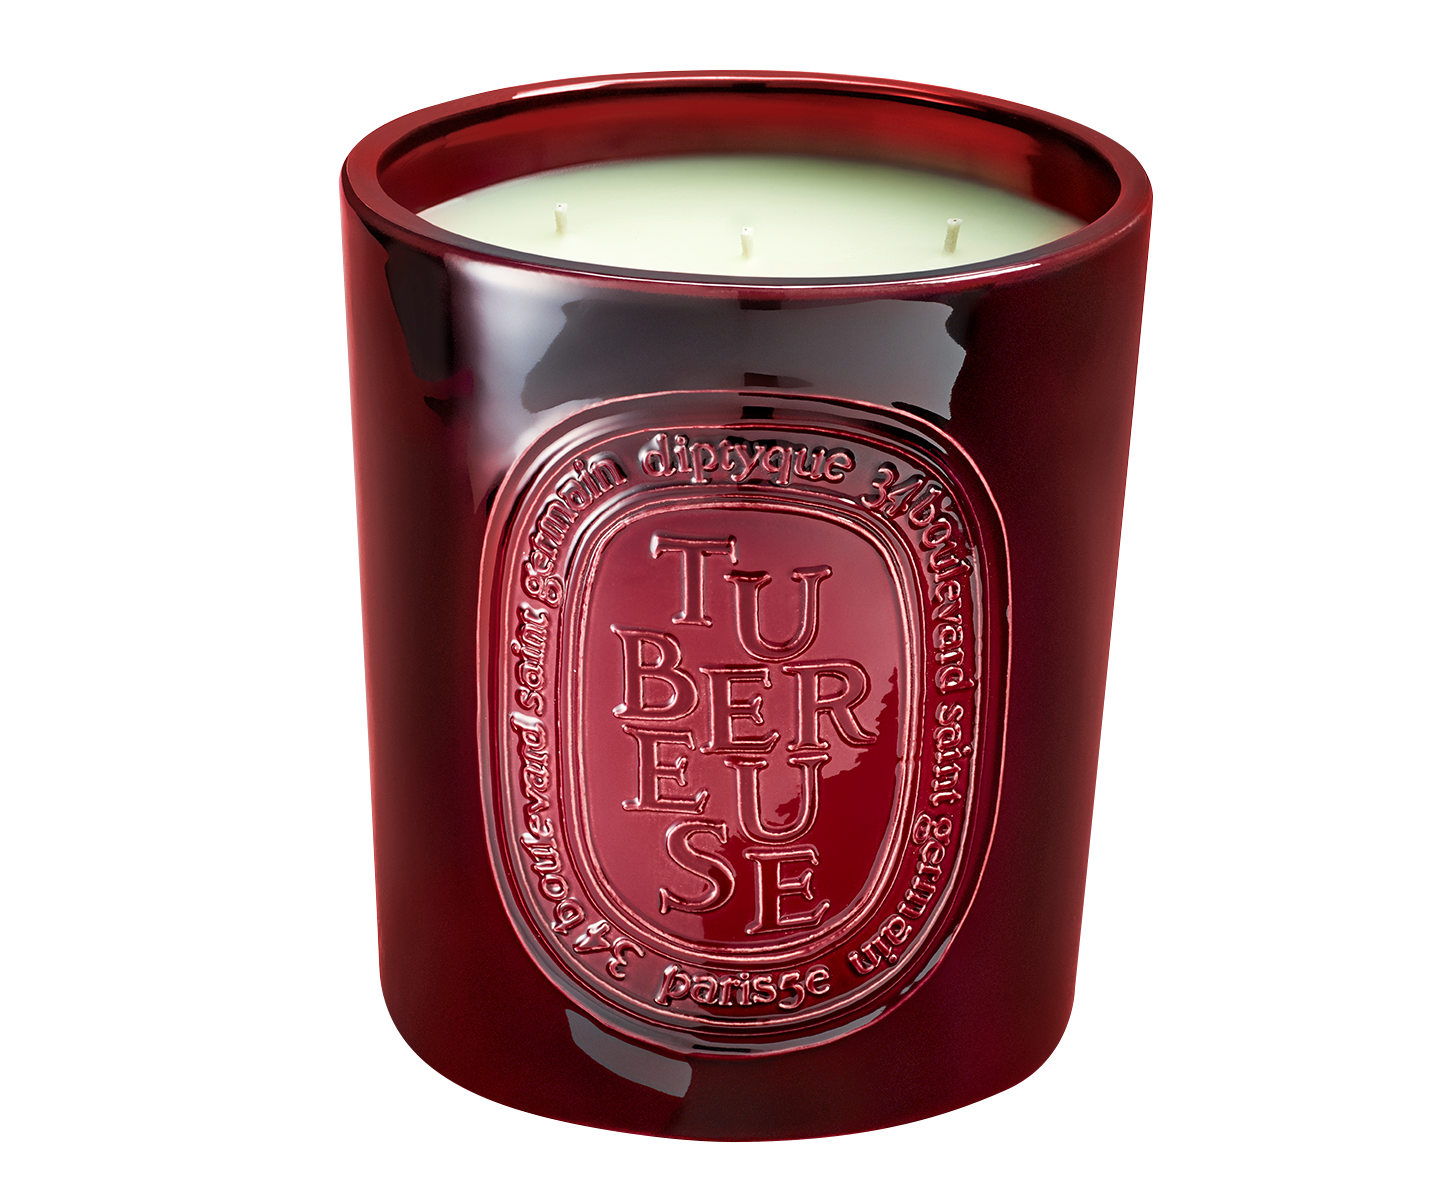 Tubéreuse / Tuberose interior & exterior candle